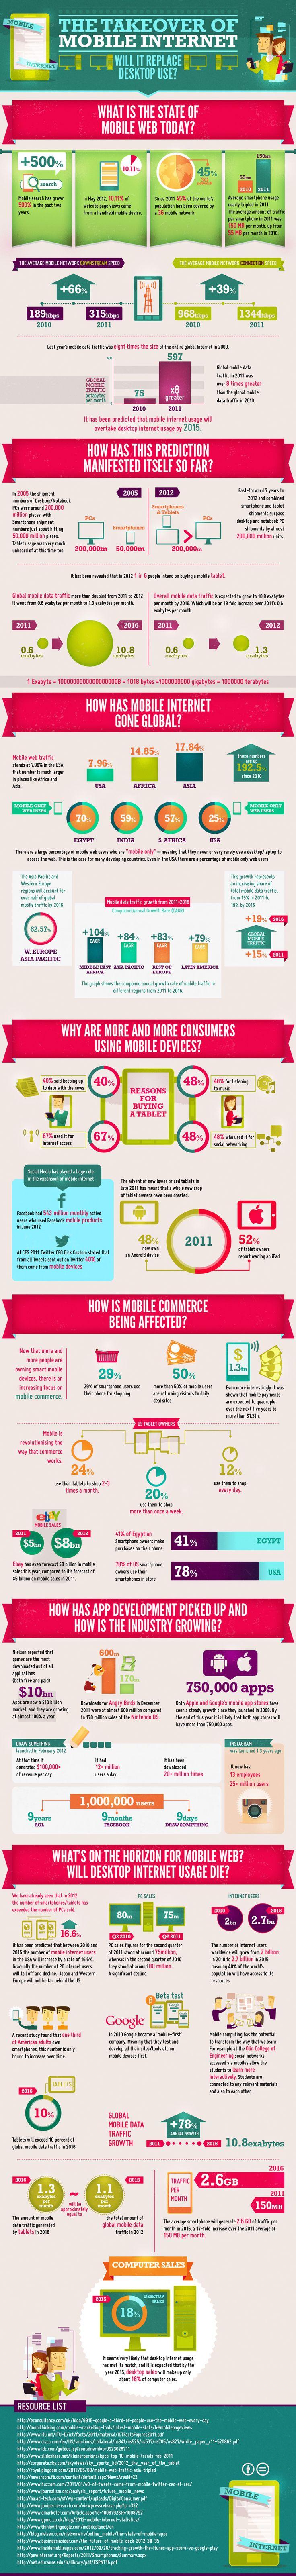 [13.11.2012] Infografik: Mobile Internet